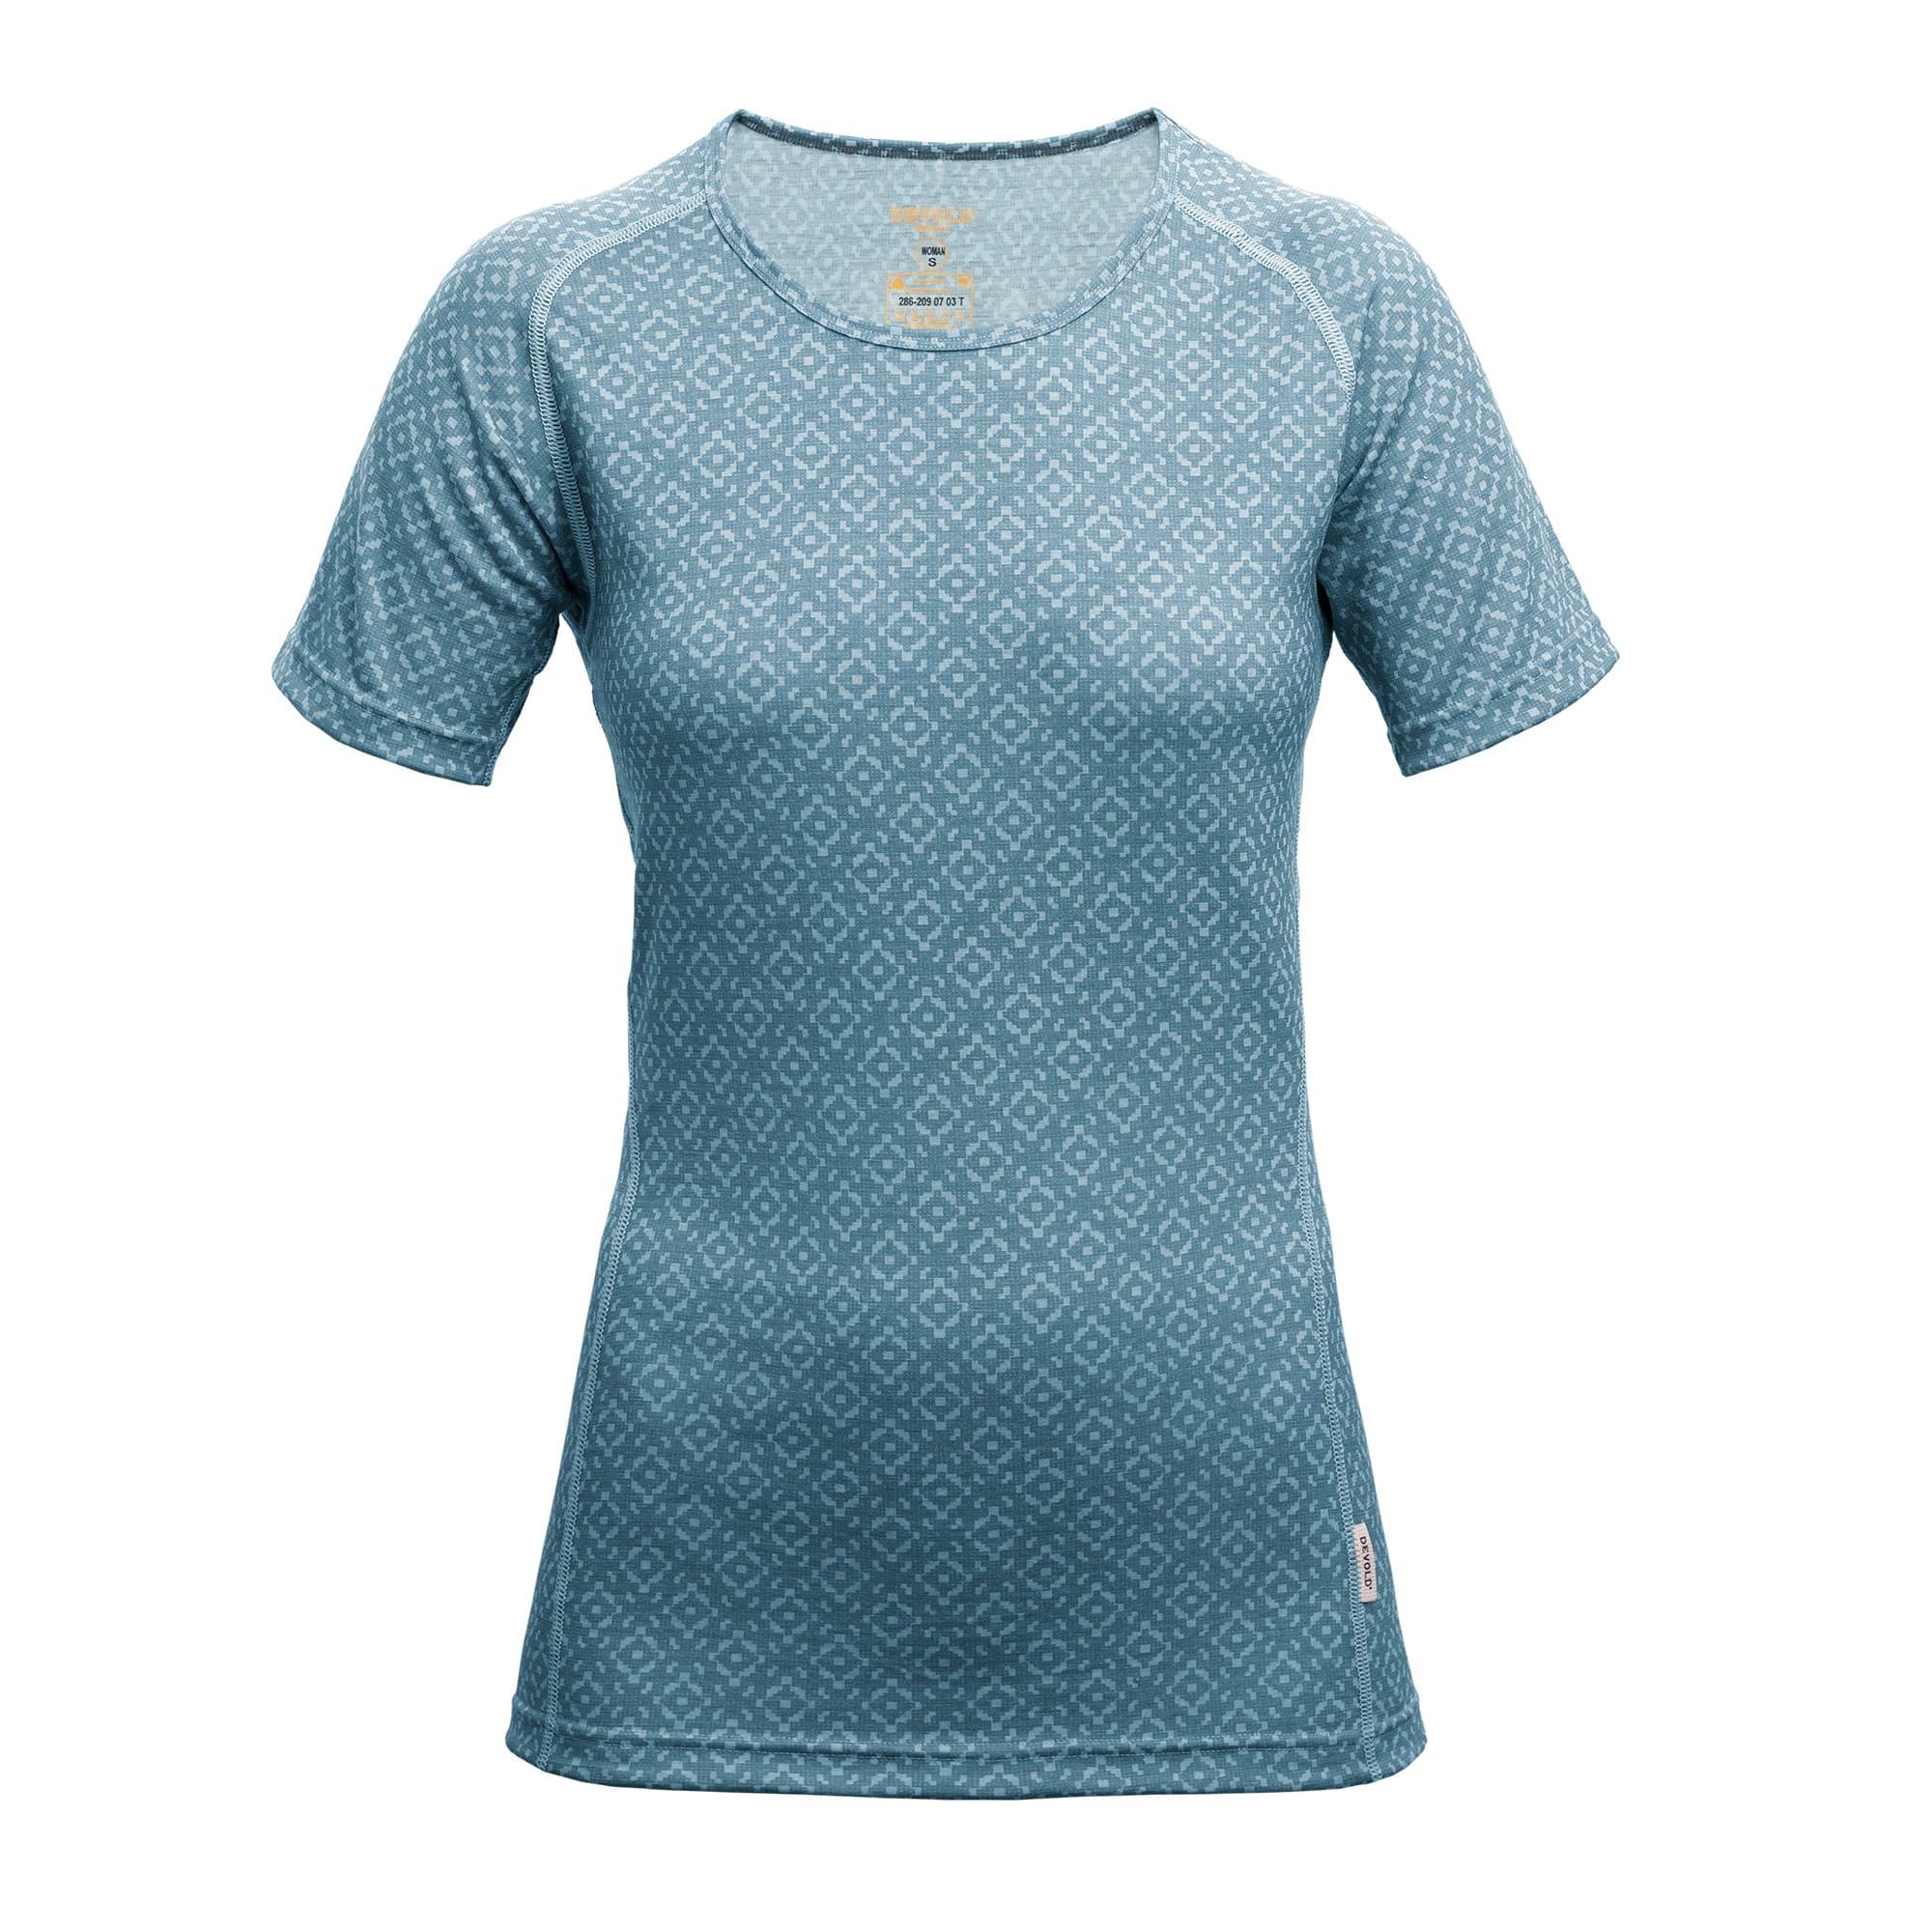 Breeze Woman T shirt Pattern